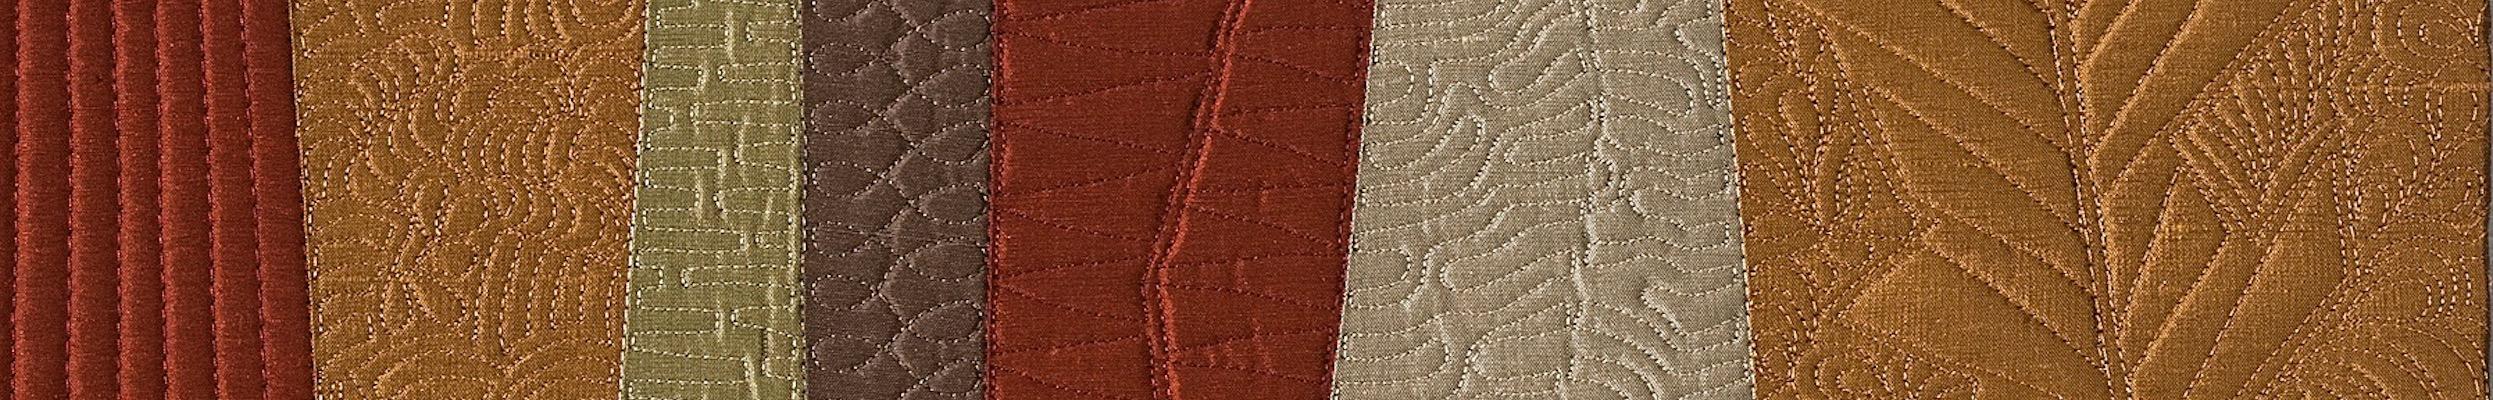 Voluta Series - detail image | Voluta #2: Recoil | © 2013